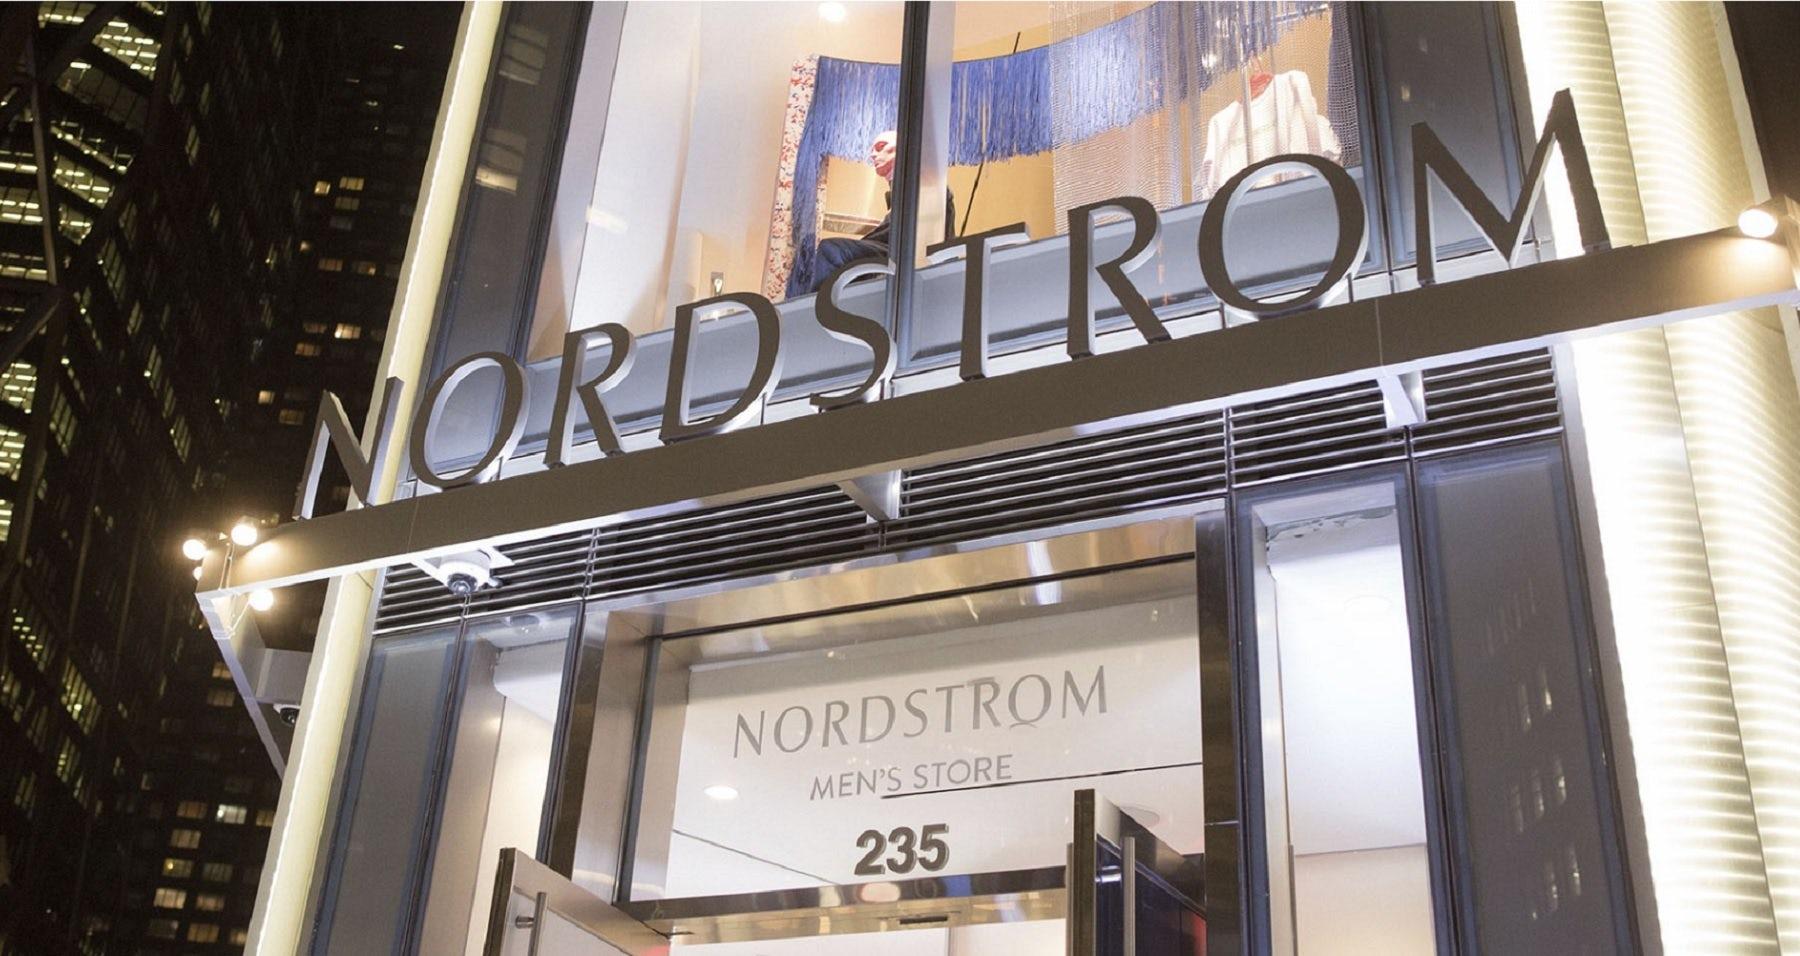 Good Nordstrom Menu0027s Store | Source: Nordstrom